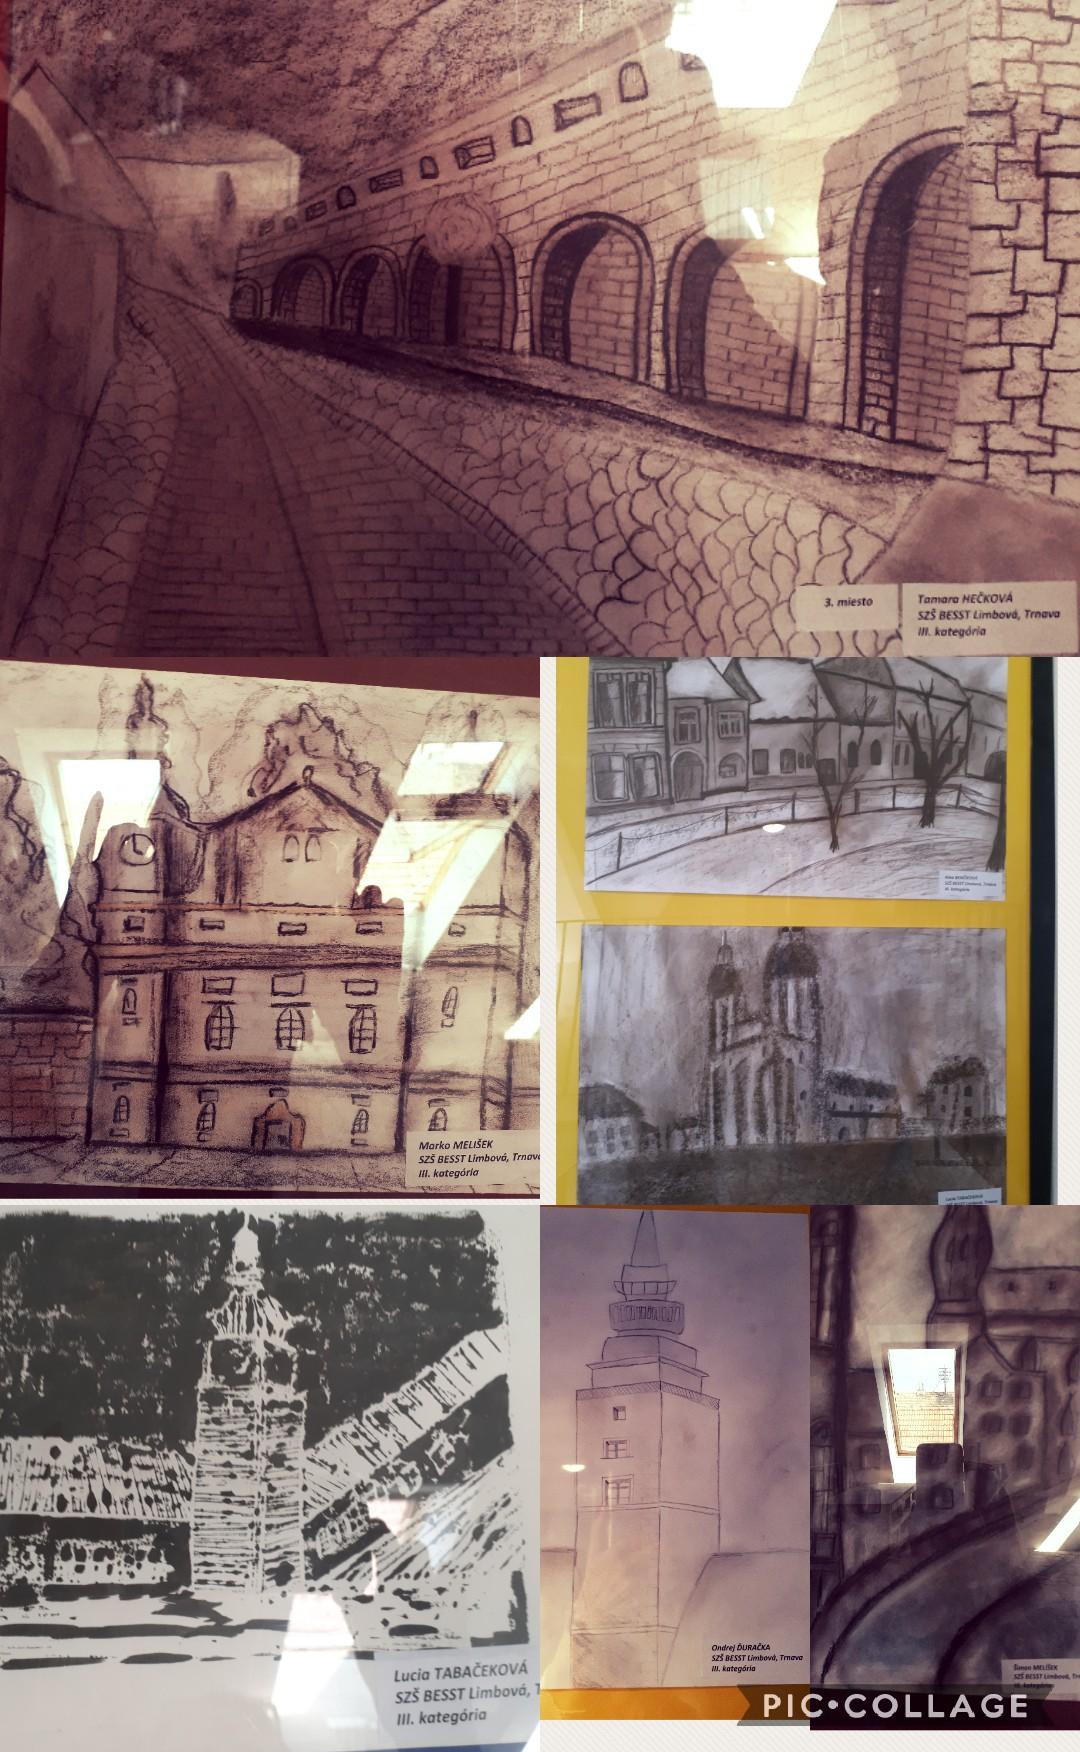 Collage 2018-05-14 20_57_56.jpg